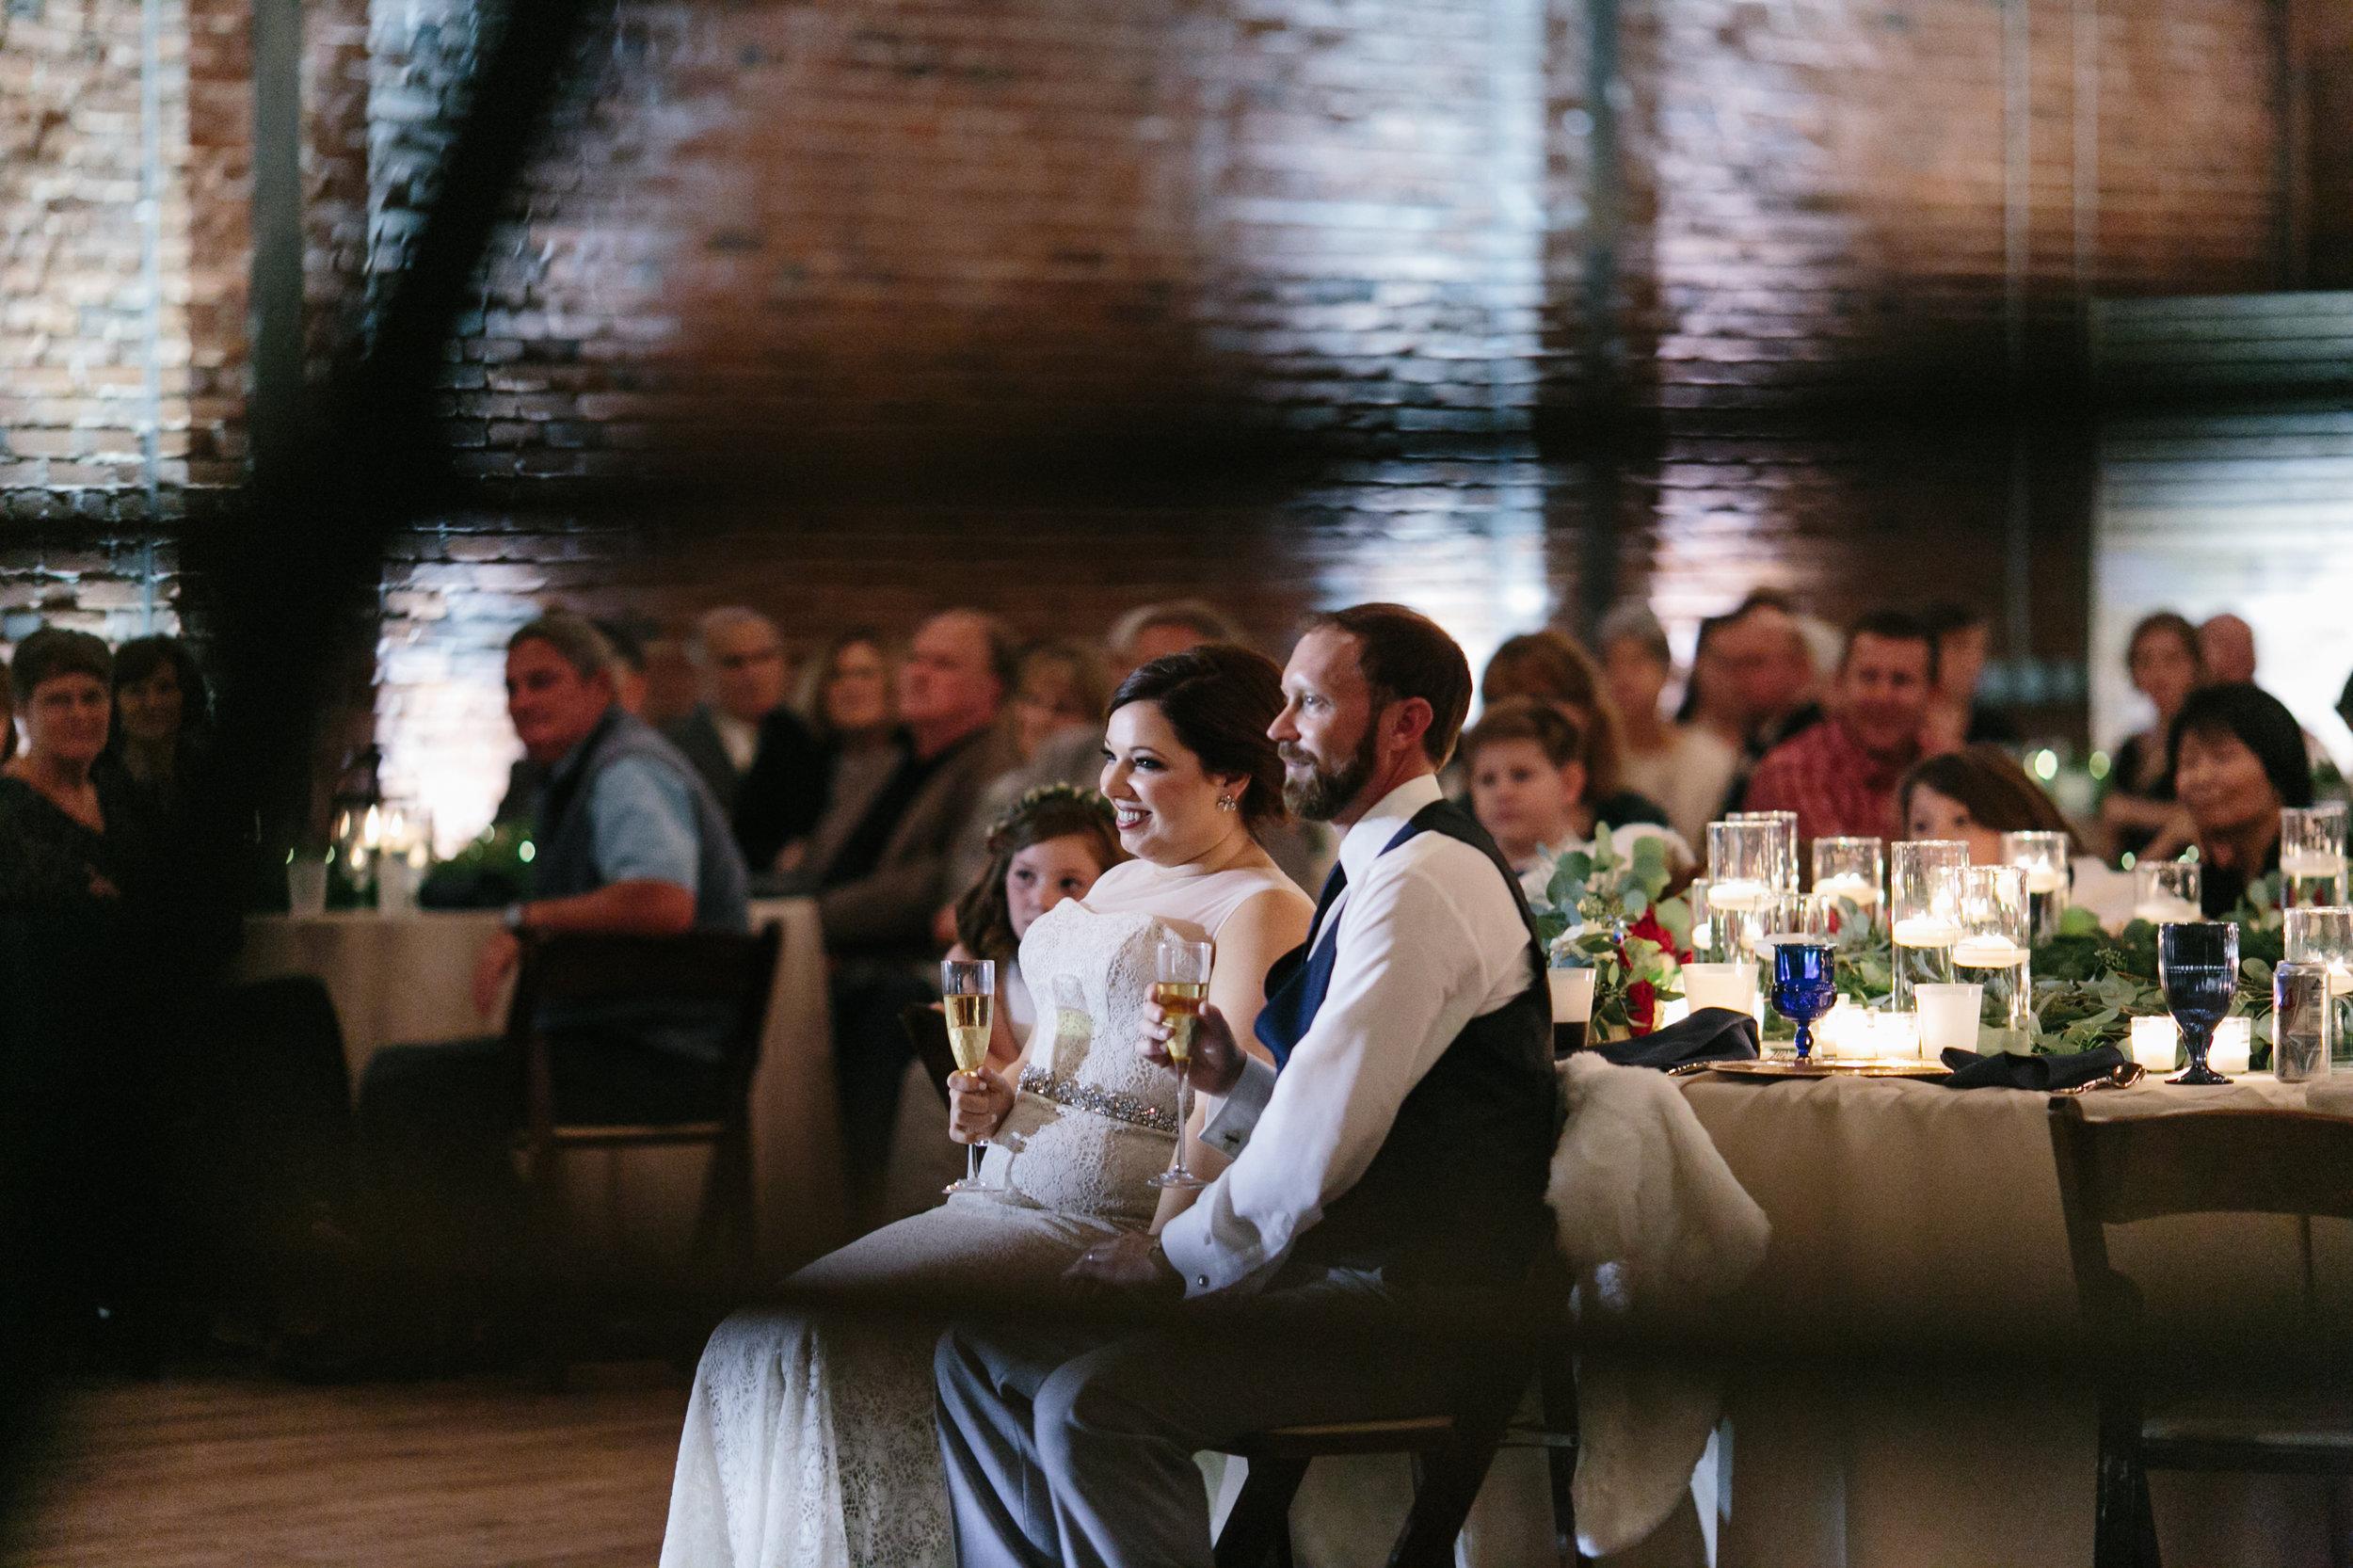 Jessica_Bryan_Wedding_Standard_Knoxville_Abigail_Malone_Photography-652.jpg